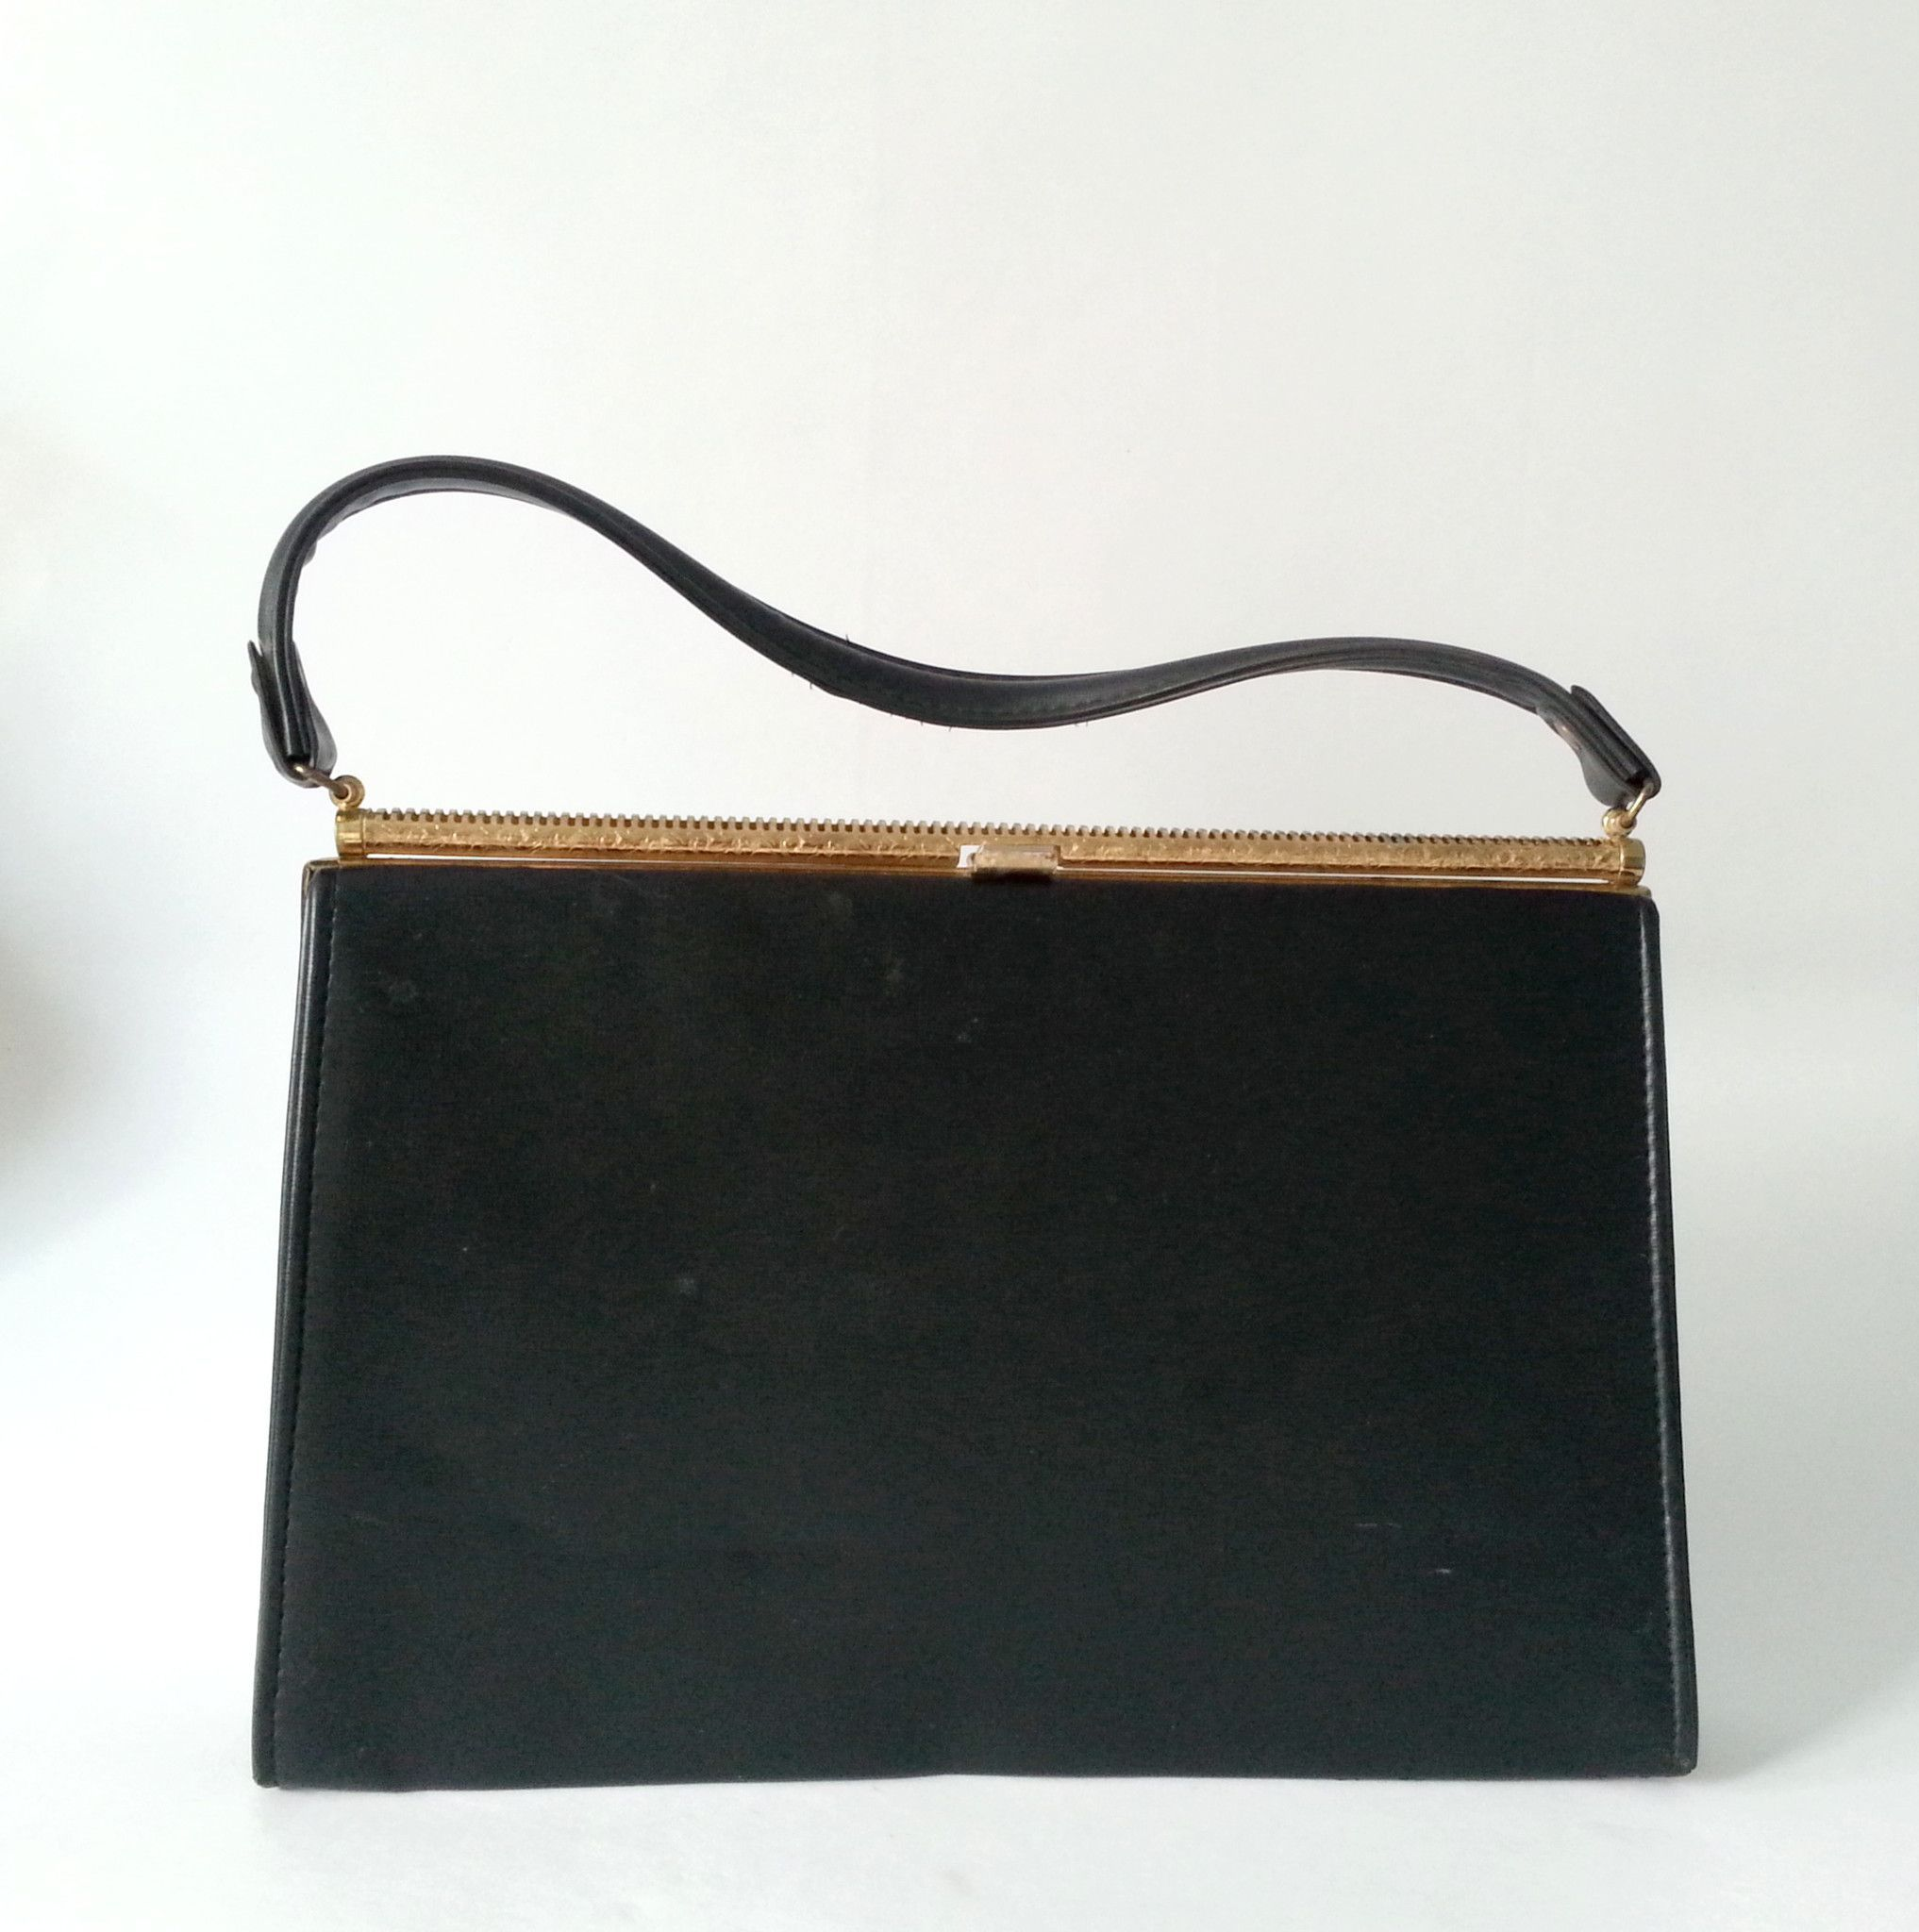 e58f0781485f SALE! 1950s black vintage handbag by Jaclyn. With gold tone metal ...